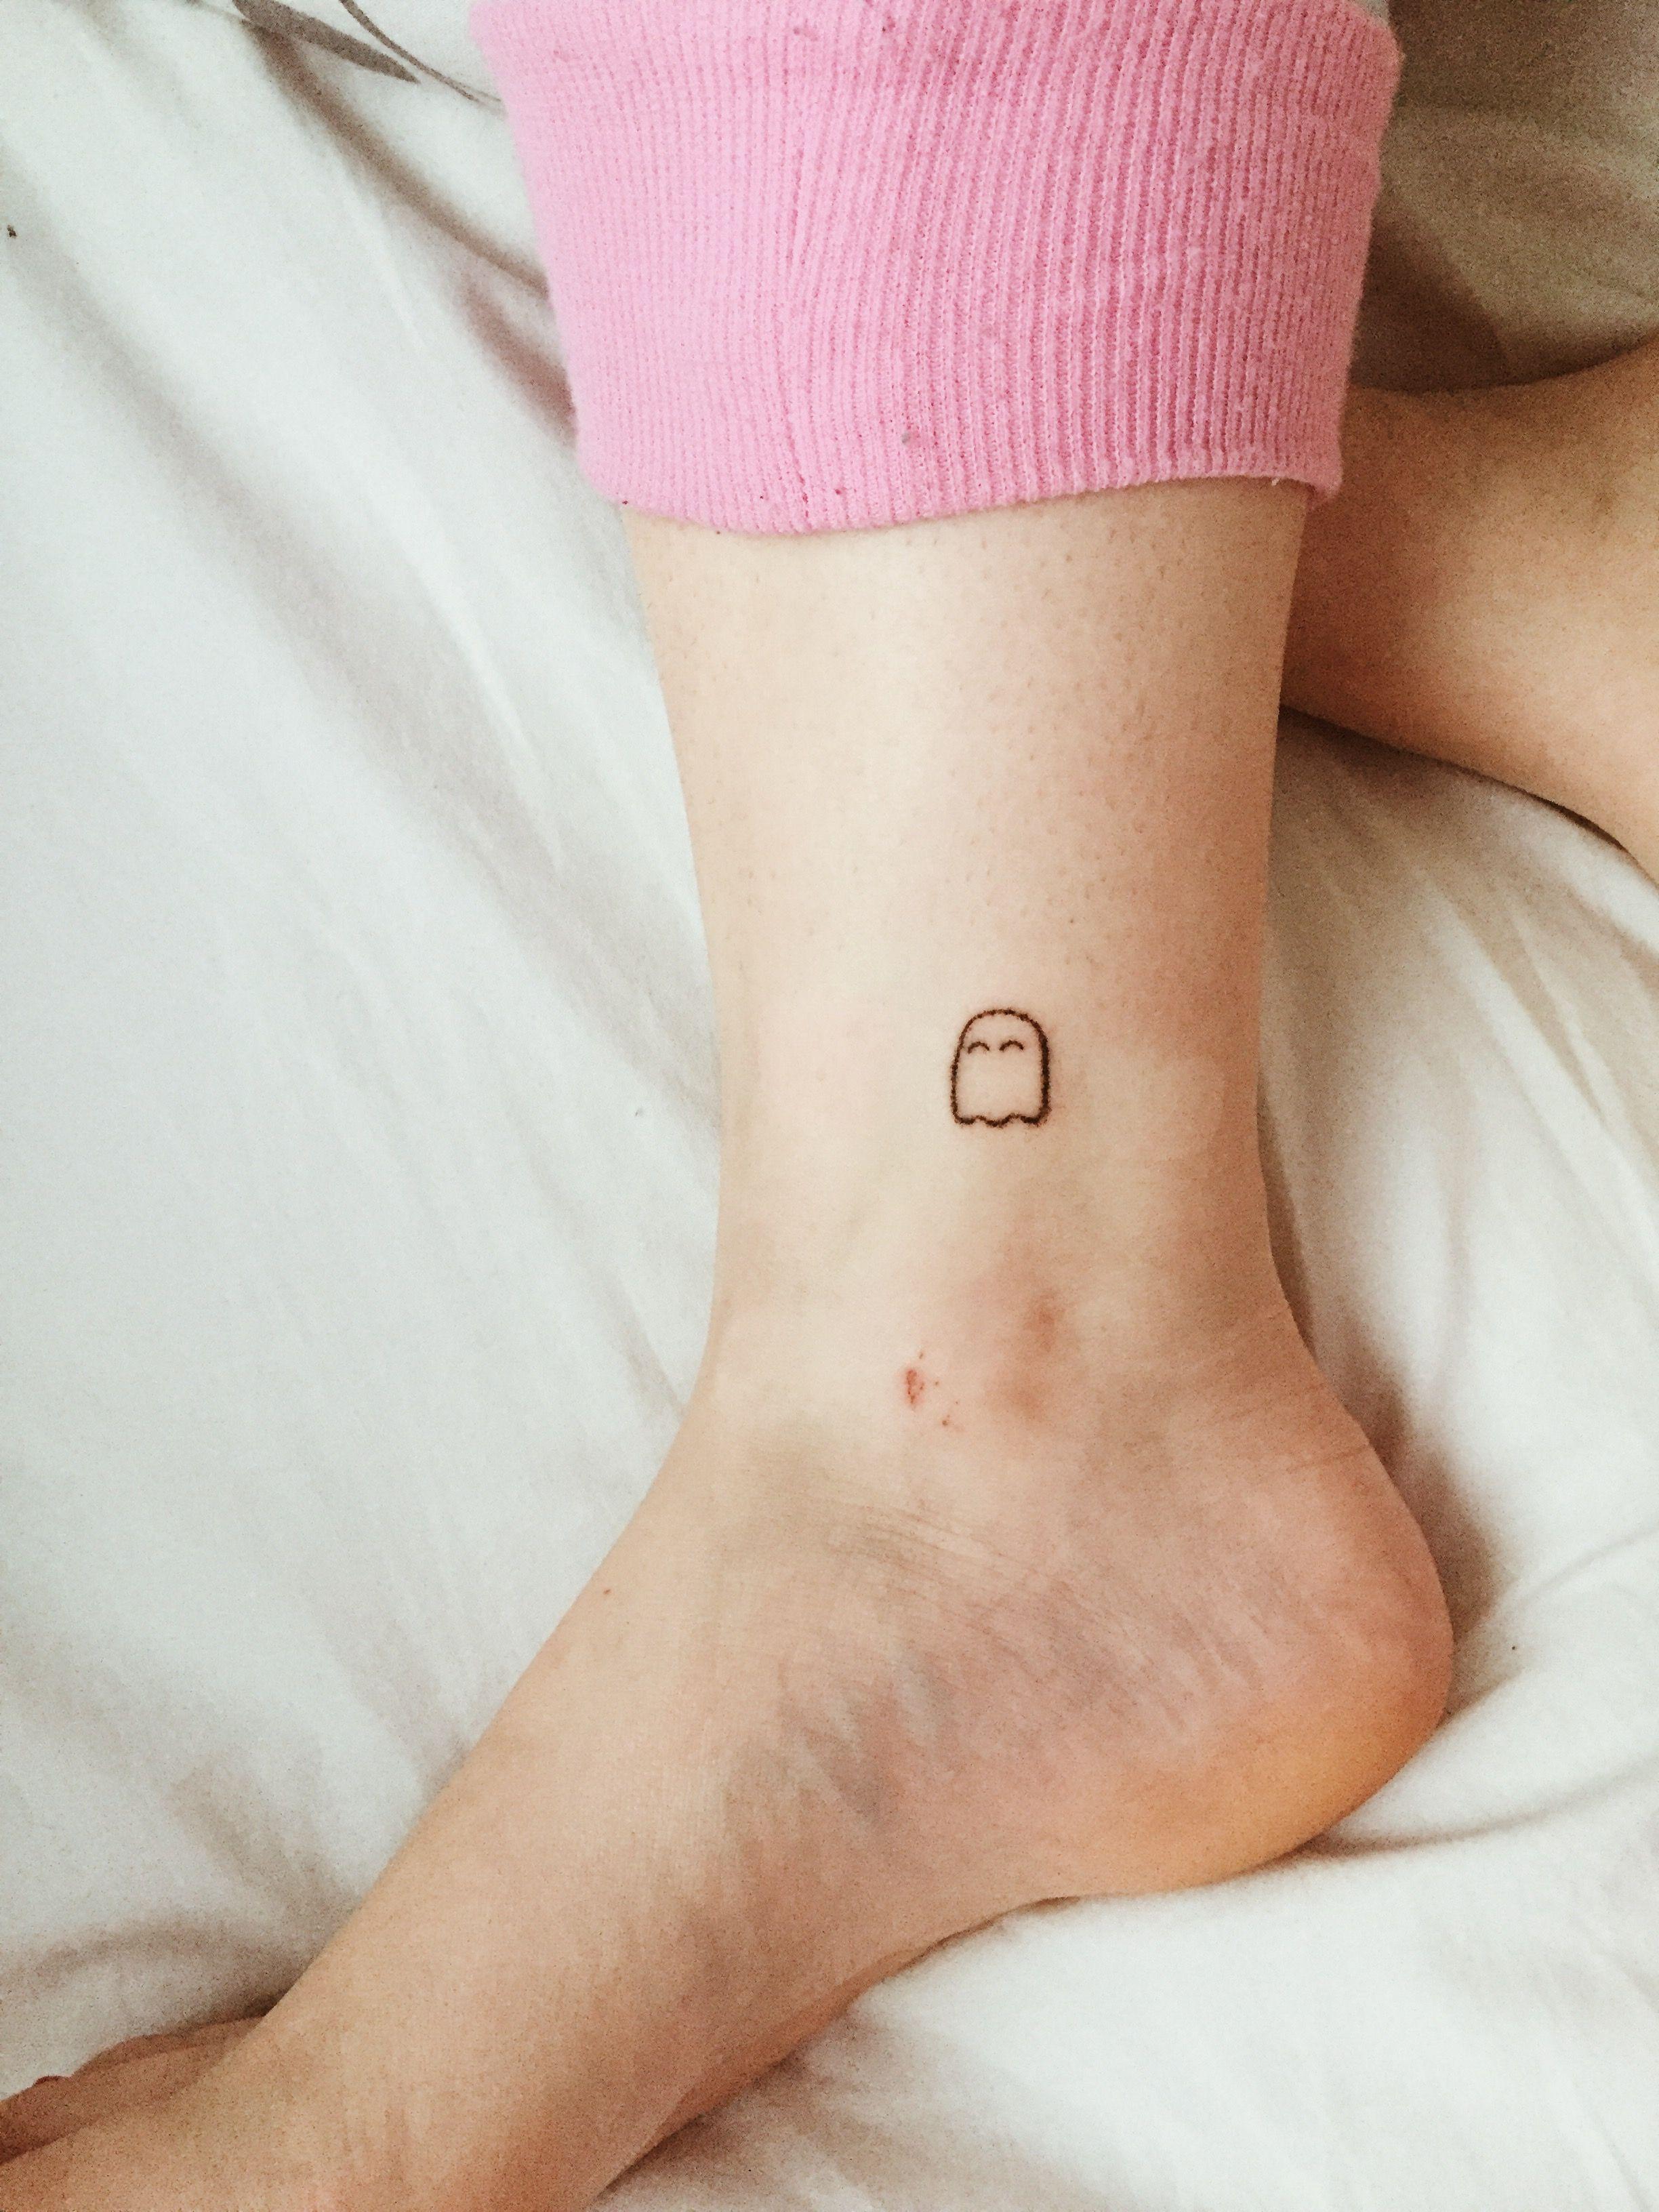 @bix.handpoke.tattoo